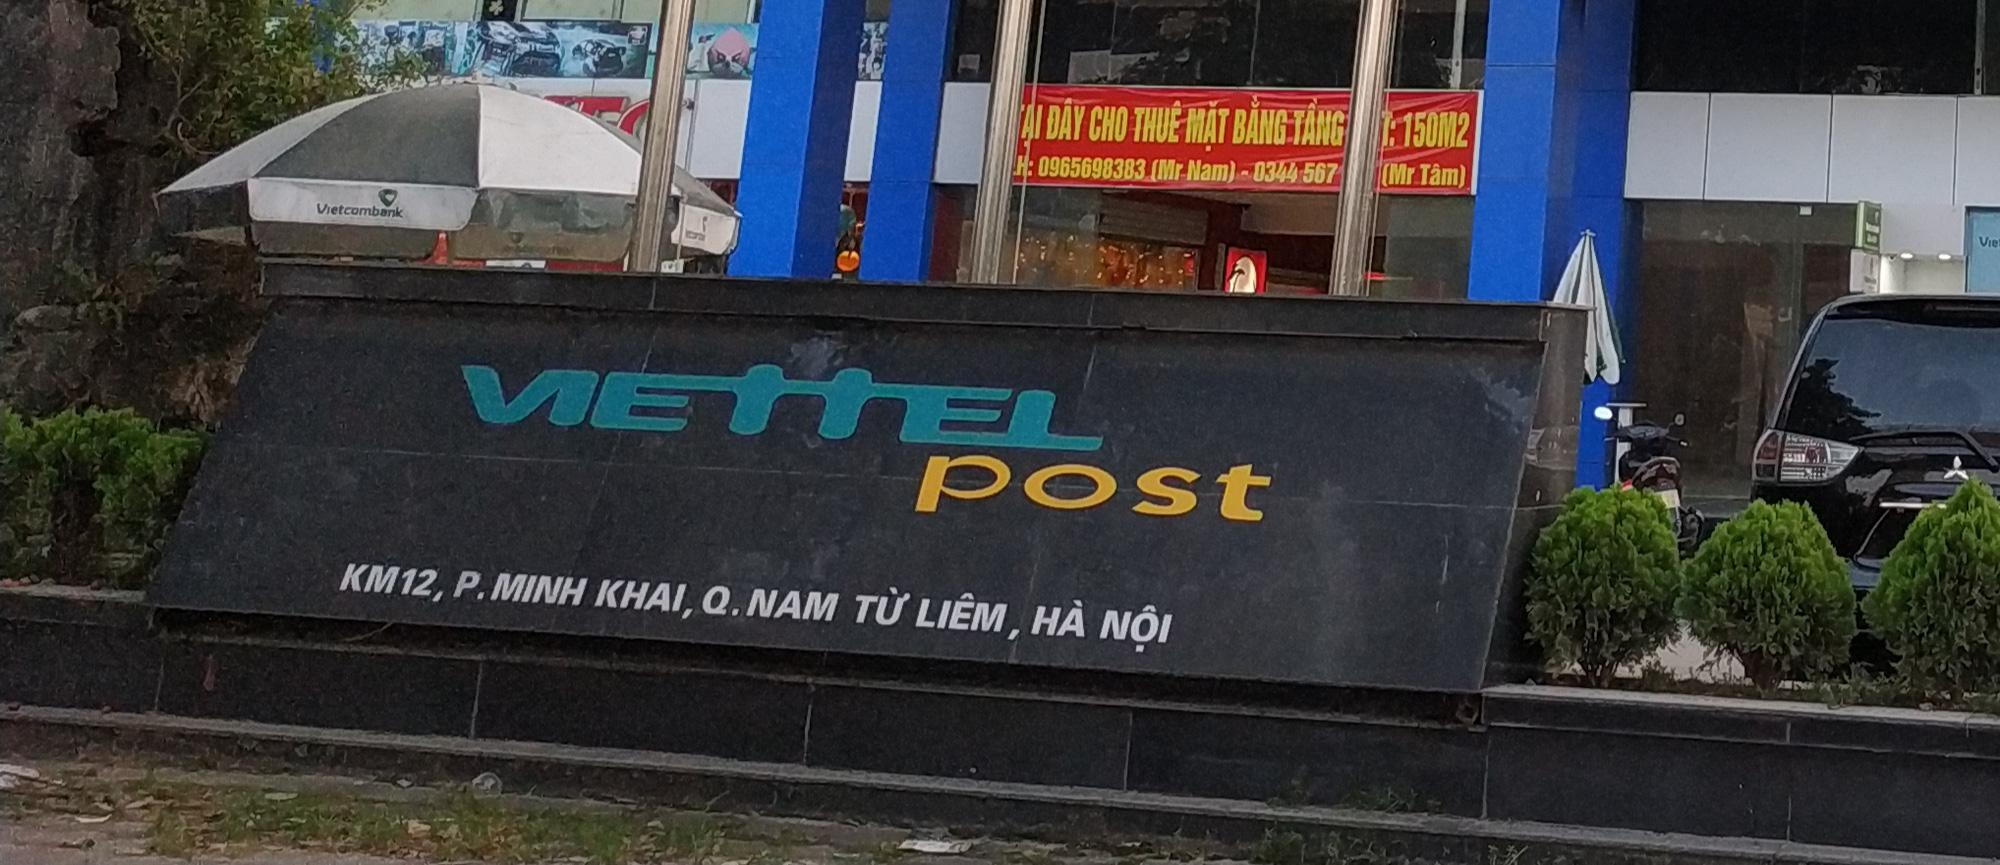 VTP Viettel Post Center self (3)